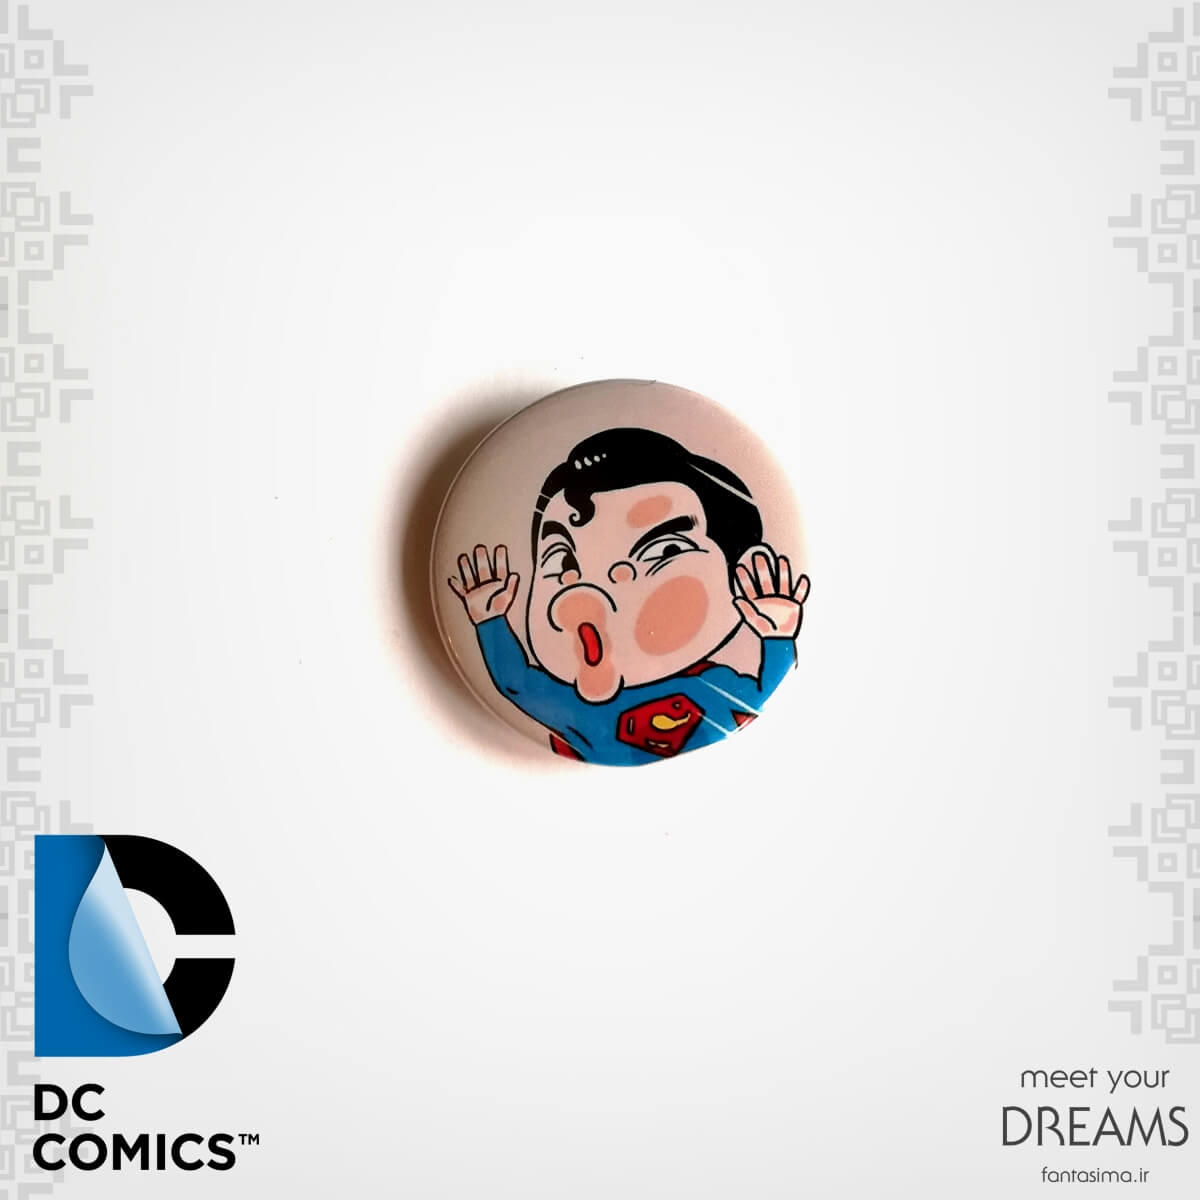 پیکسل فلزی کارتونی سوپرمن